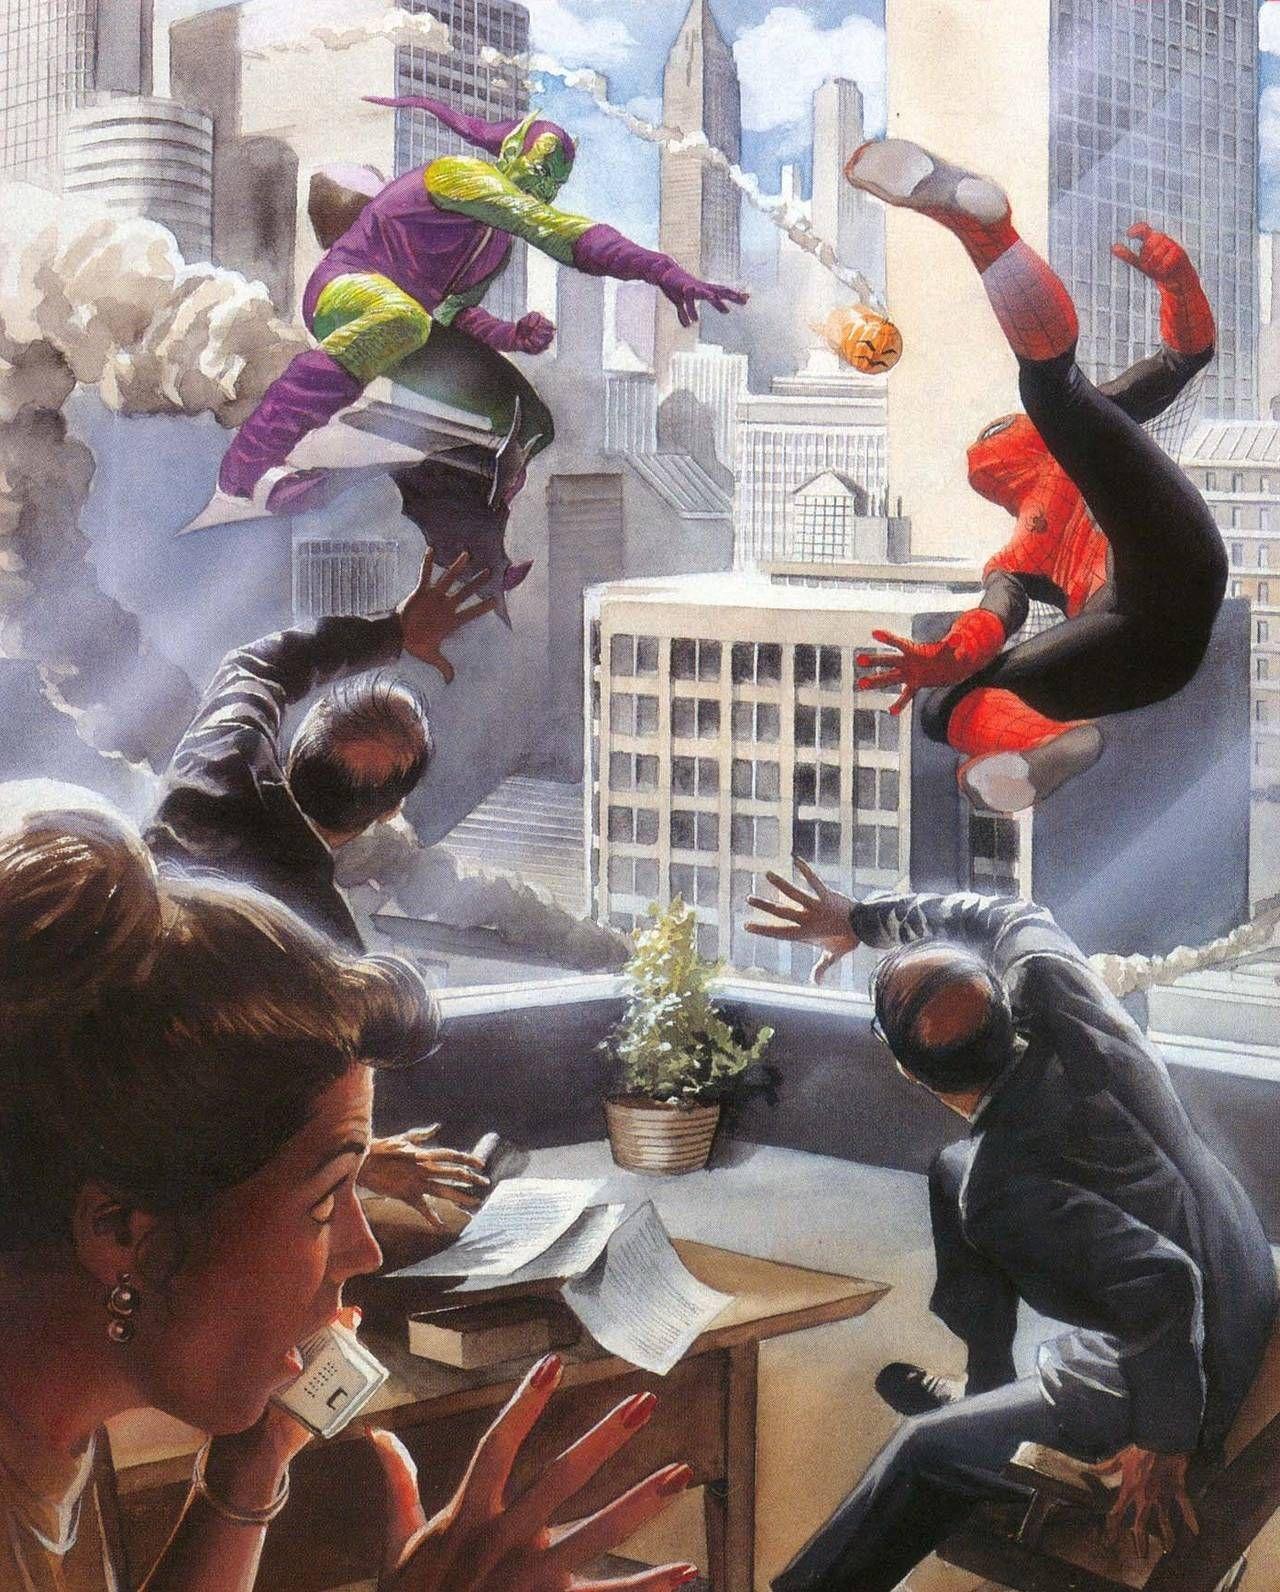 "#Spiderman #Fan #Art. (Marvels ""Preview Issue"" #0 Cover) By: John Romita Sr & Alex Ross. (THE * 5 * STÅR * ÅWARD * OF: * AW YEAH, IT'S MAJOR ÅWESOMENESS!!!™)[THANK Ü 4 PINNING<·><]<©>ÅÅÅ+(OB4E)"